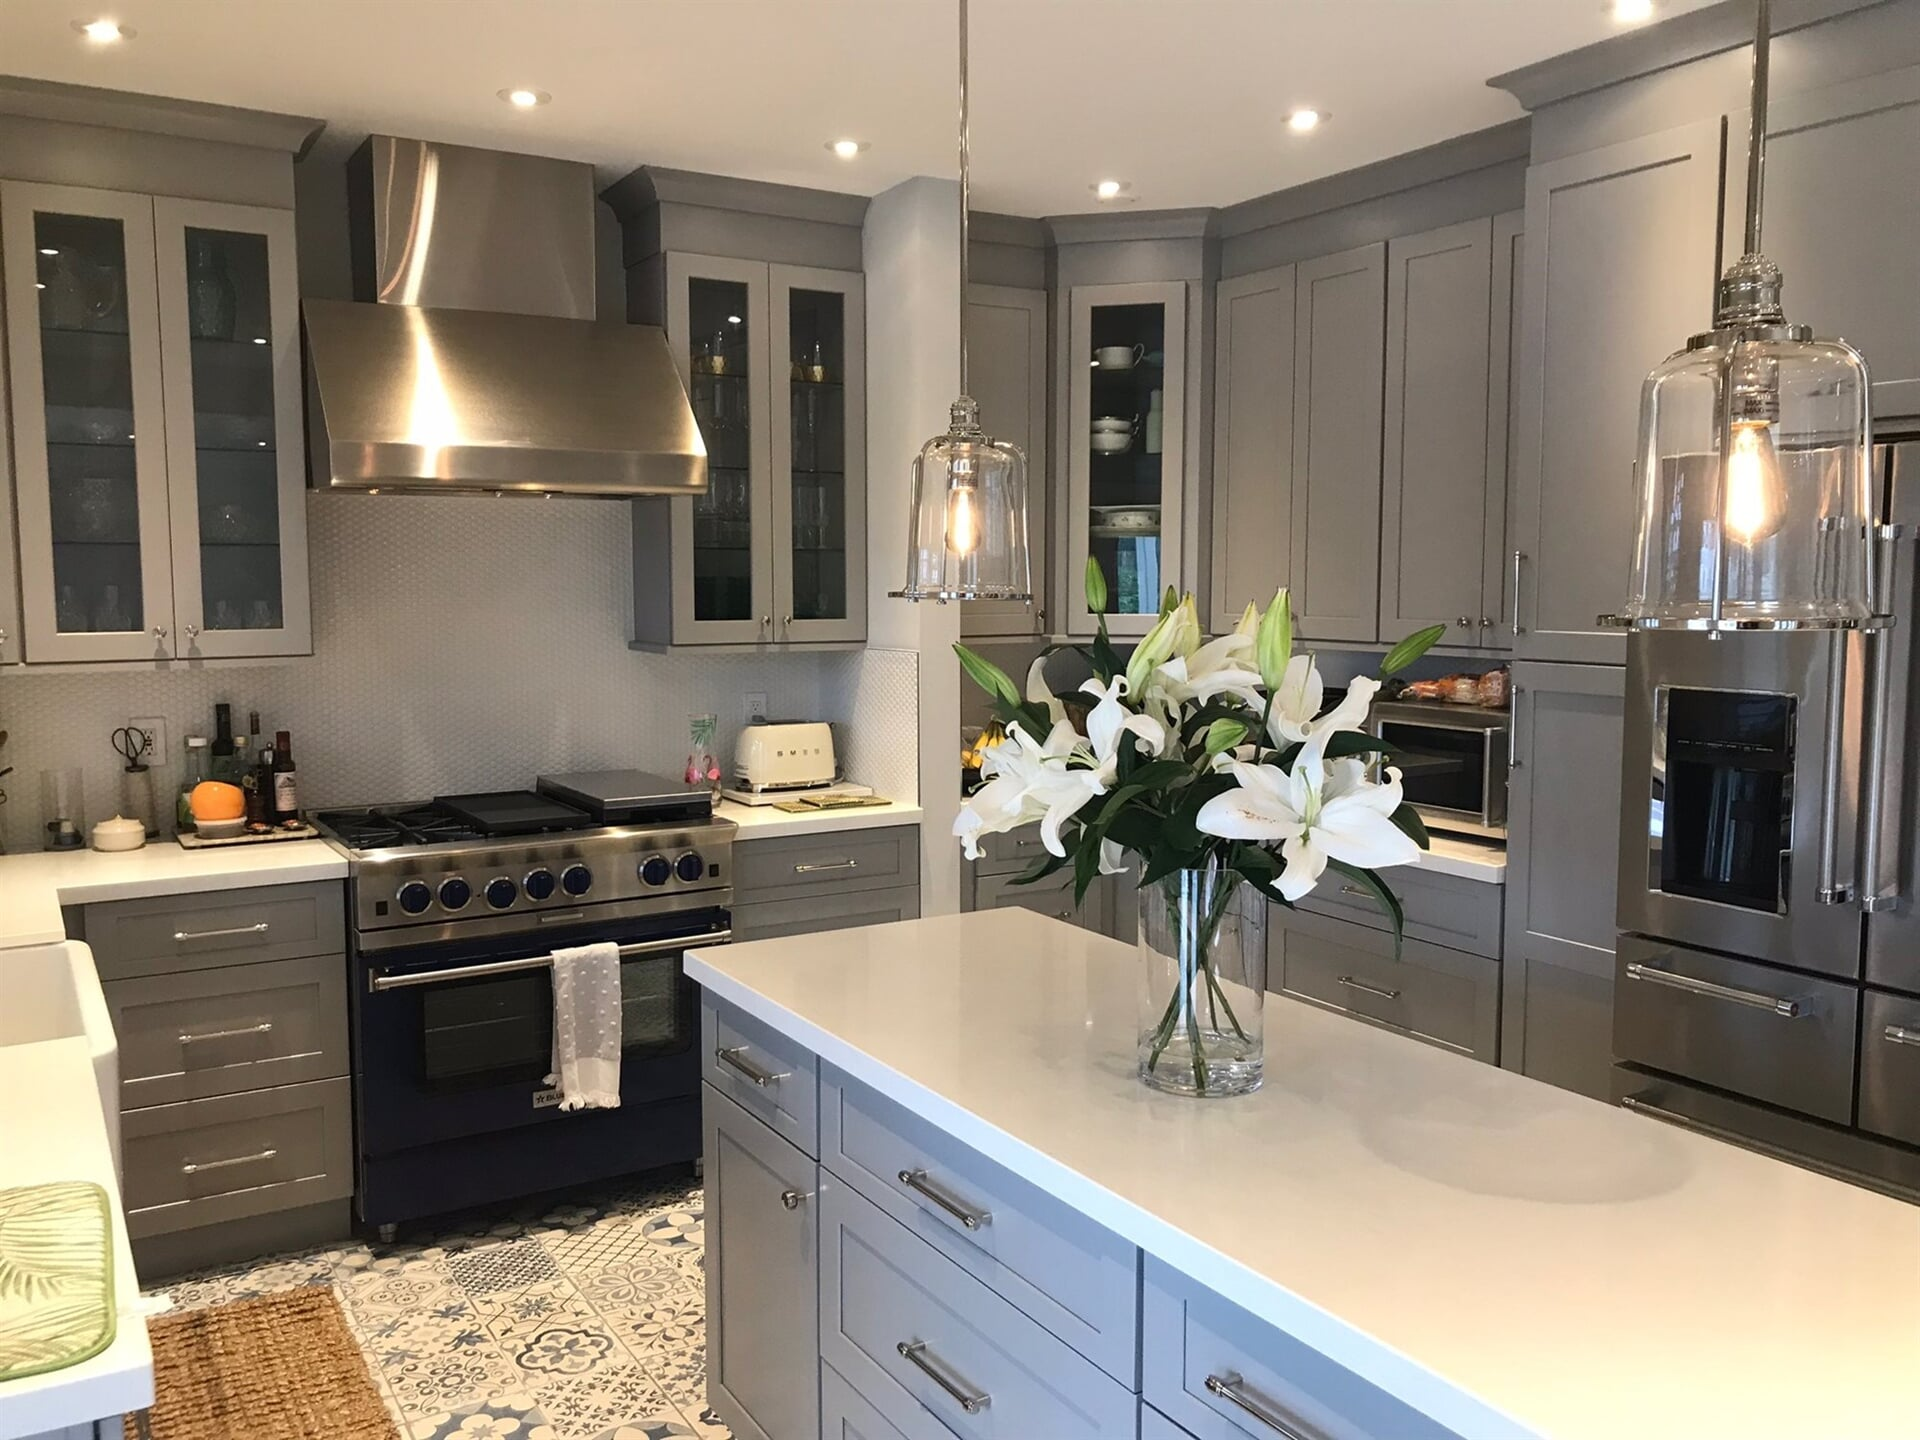 Grey kitchen design in Juno Beach, FL from Floors For You Kitchen & Bath